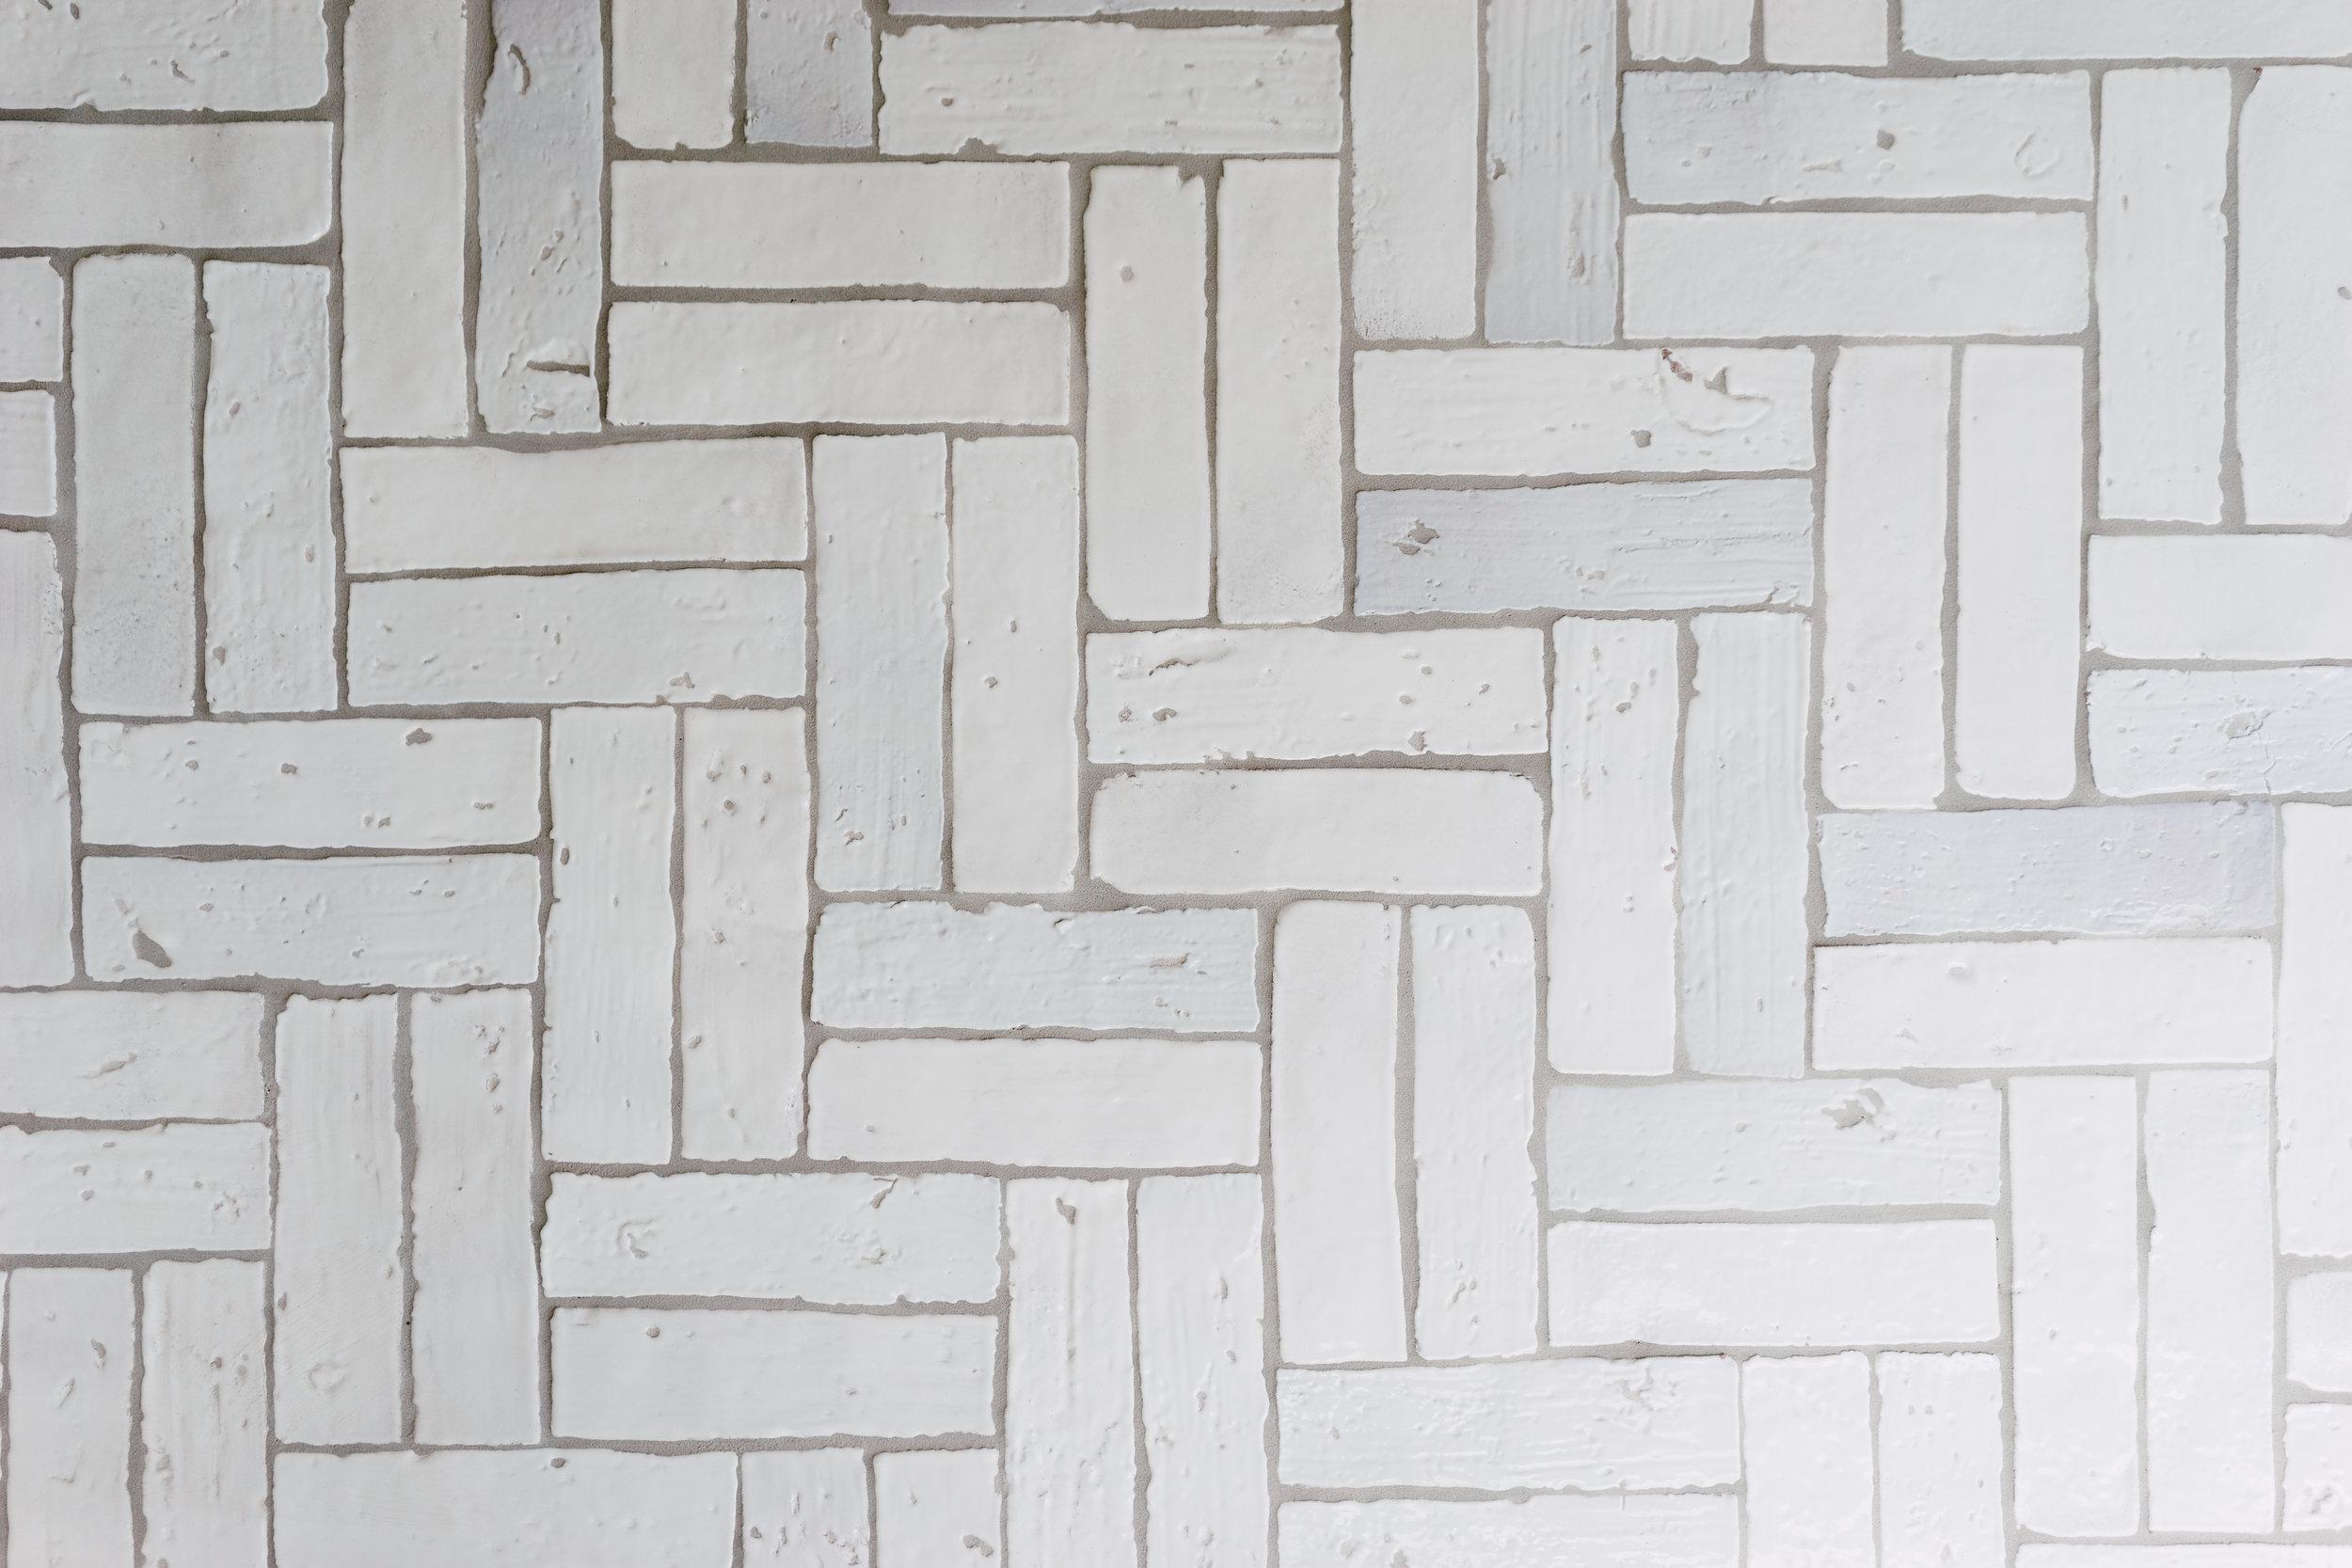 Glazed+Thin+Brick+Installed+Chase+Daniel11.jpeg